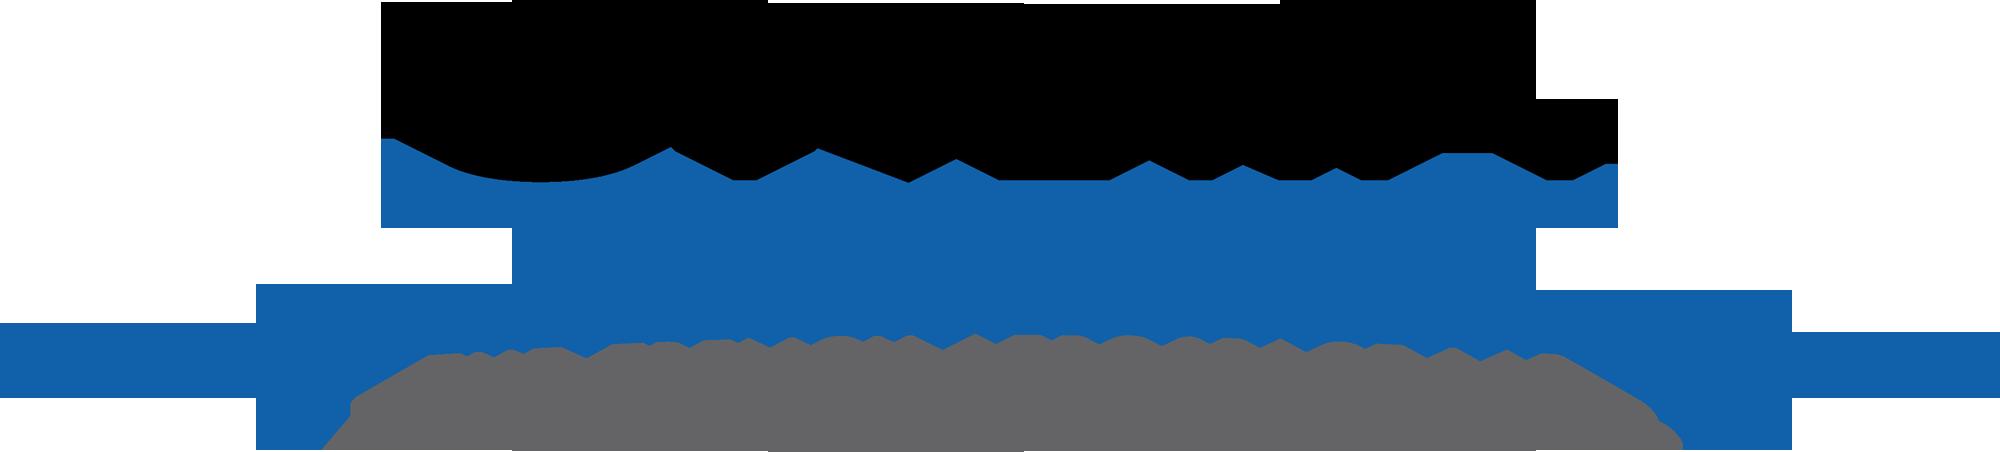 Logo de la Société ONERA